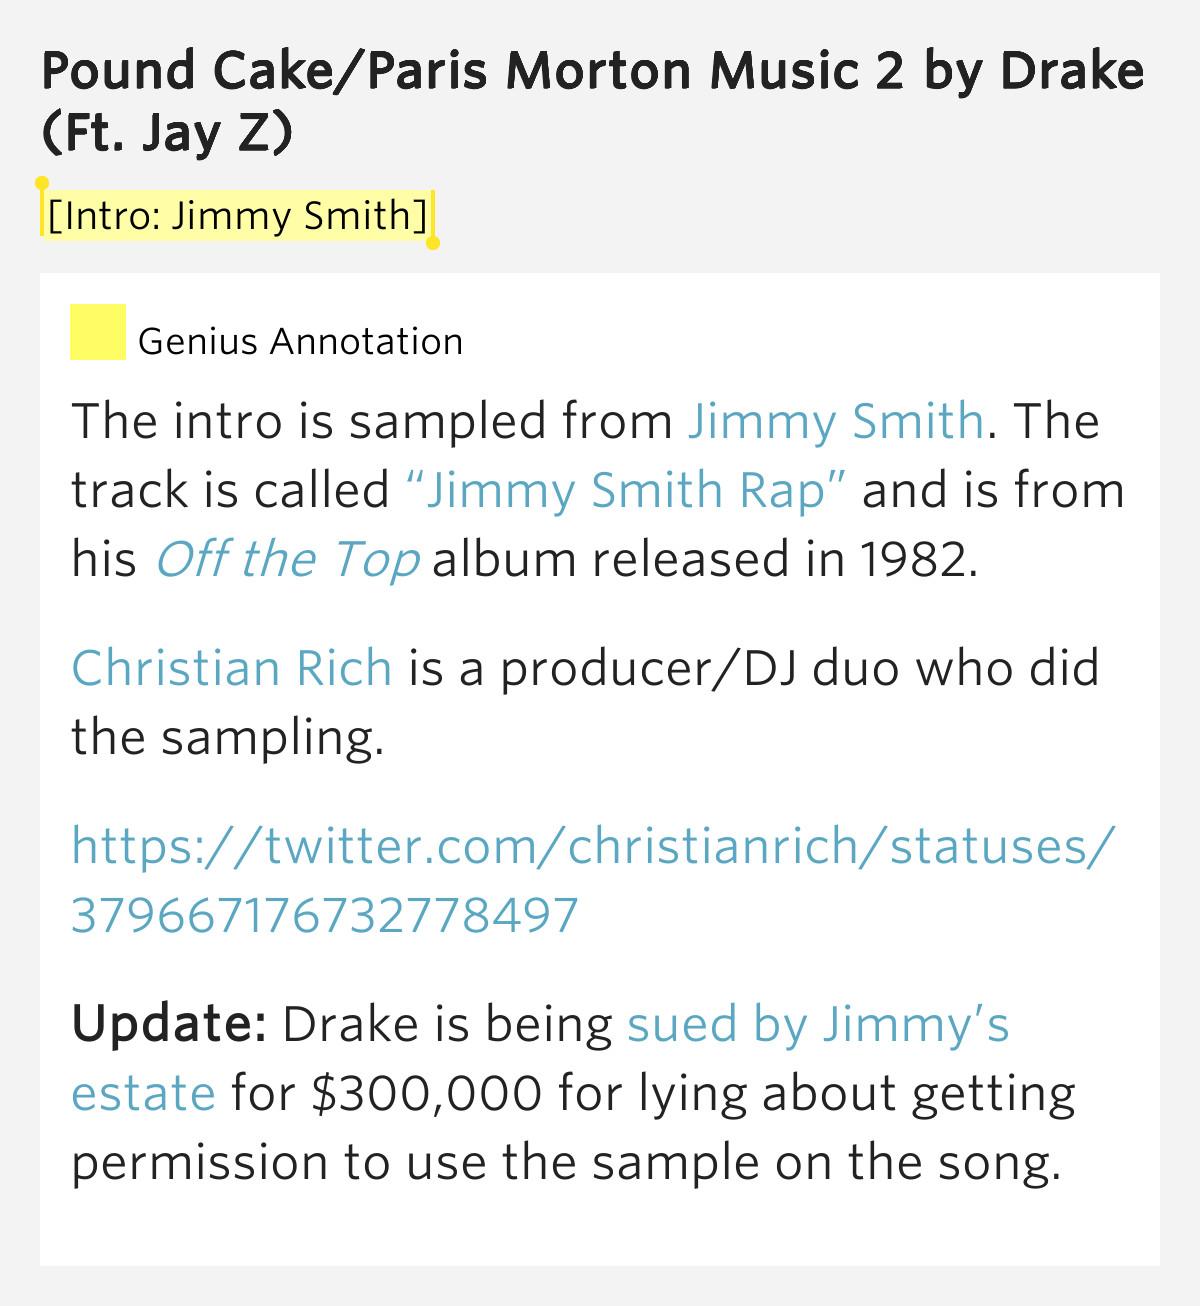 Pound Cake Lyrics  [Intro Jimmy Smith] – Pound Cake Paris Morton Music 2 by